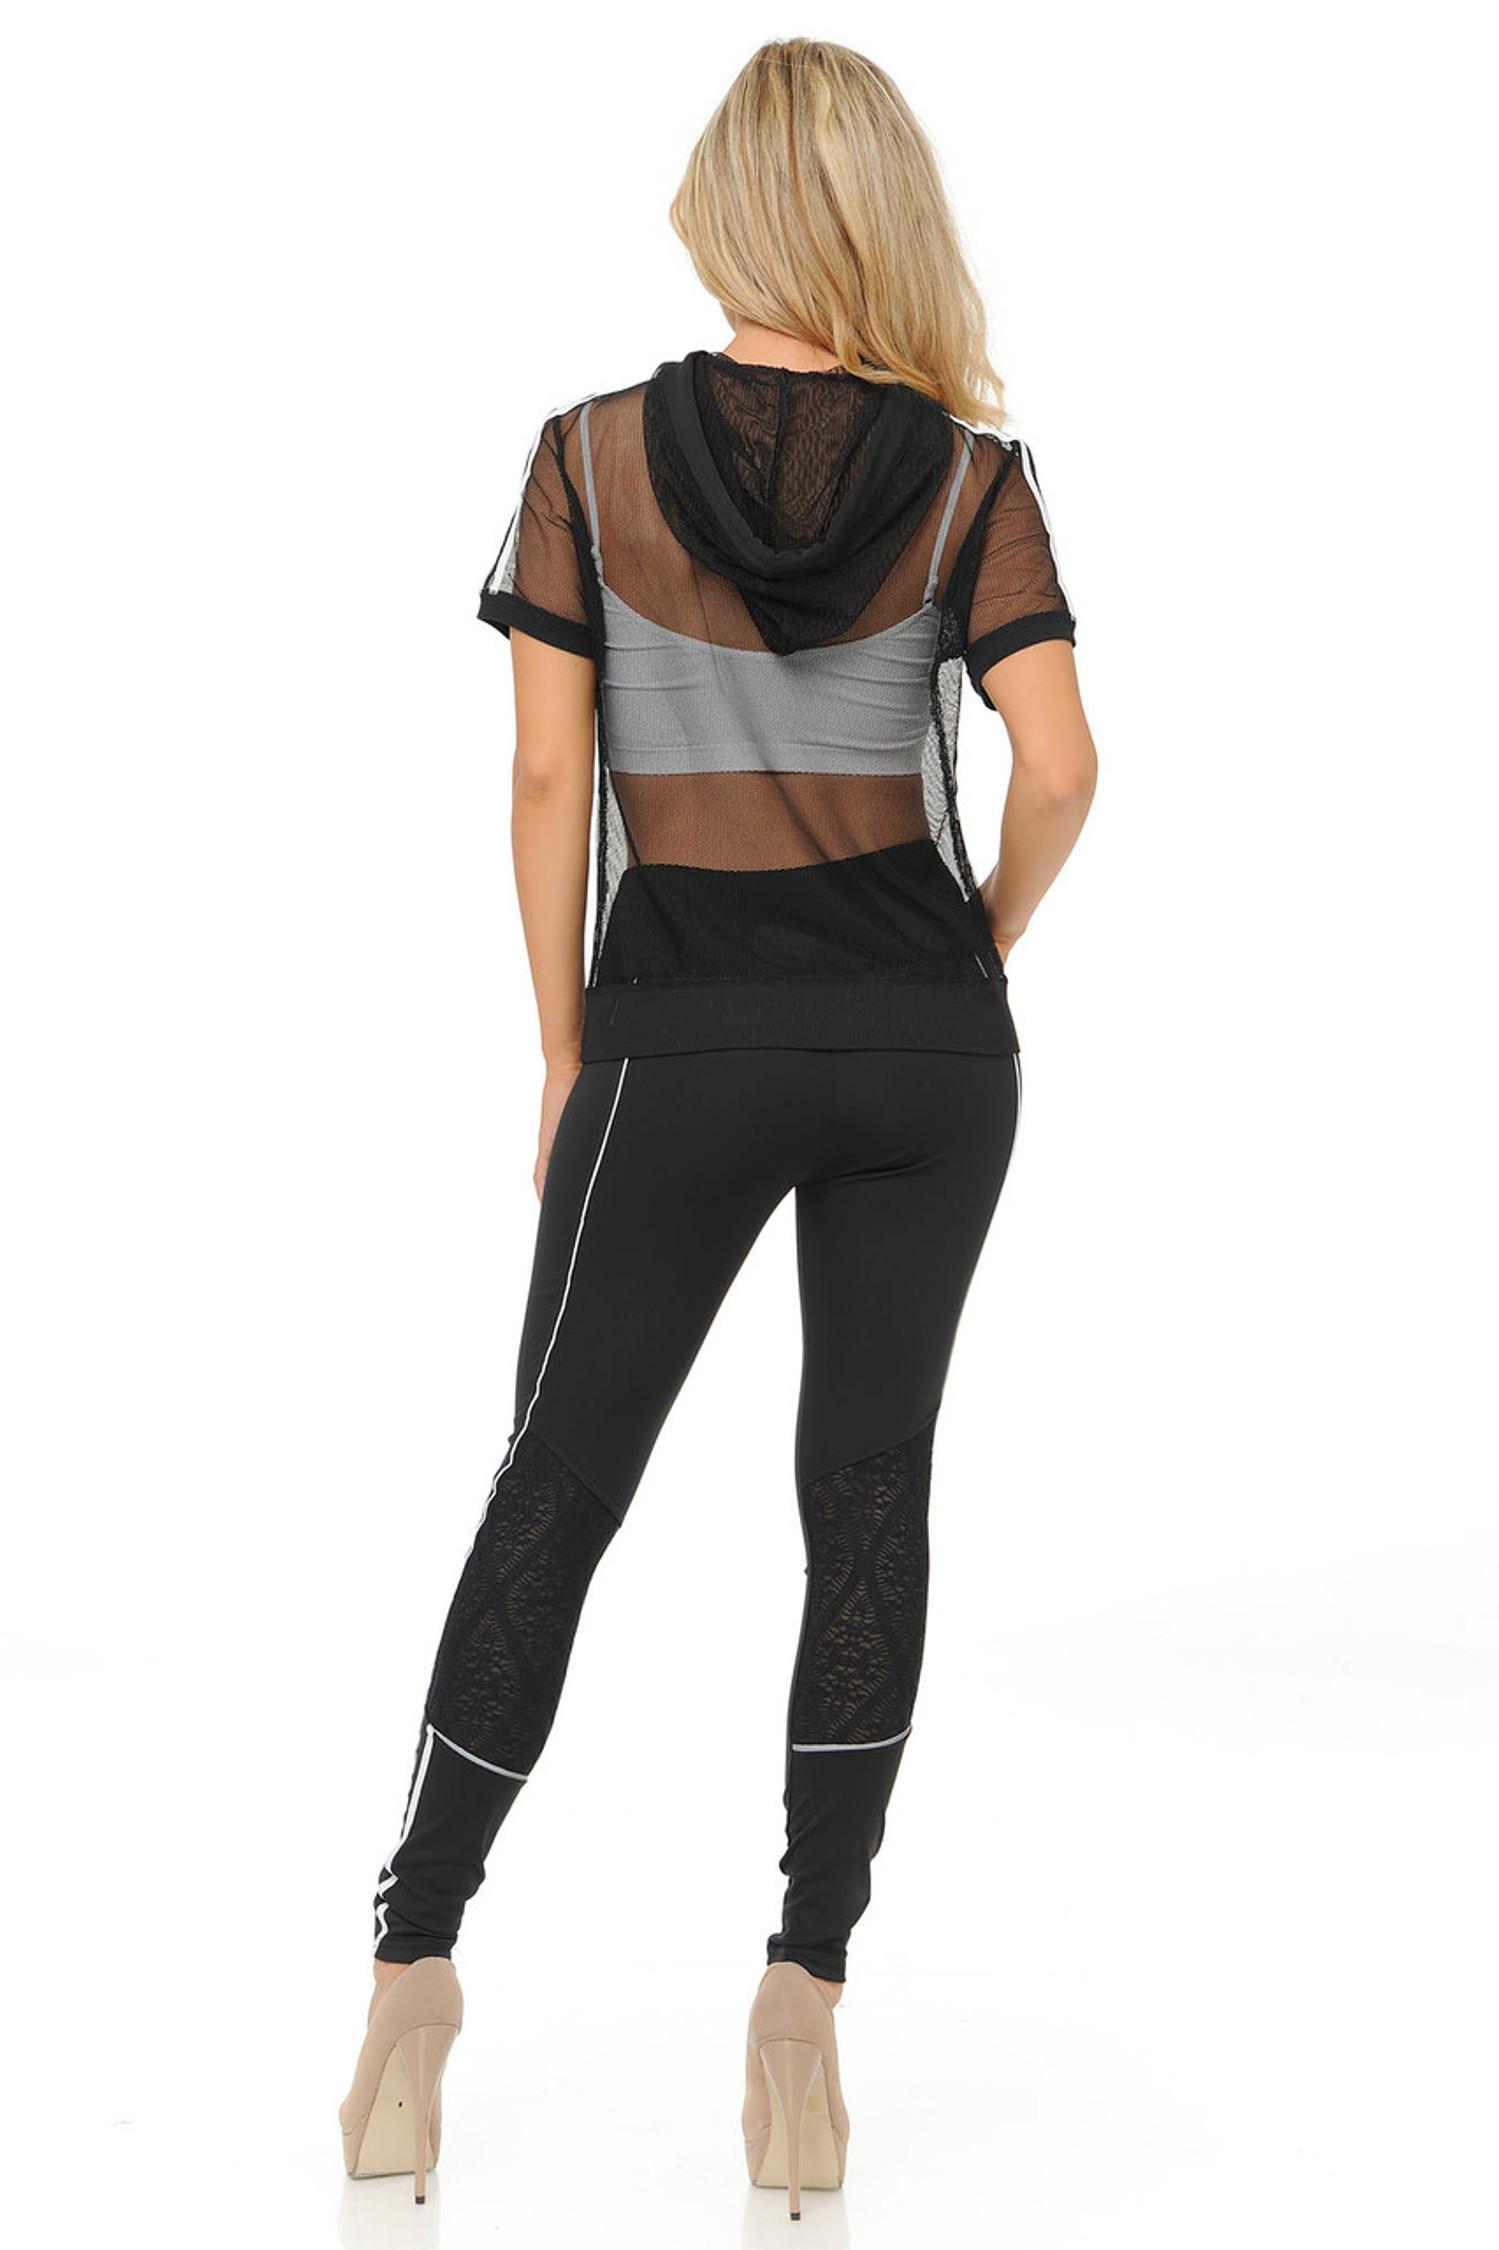 Premium Select Full Mesh Jacket with Slenderize Workout Leggings Set - Black